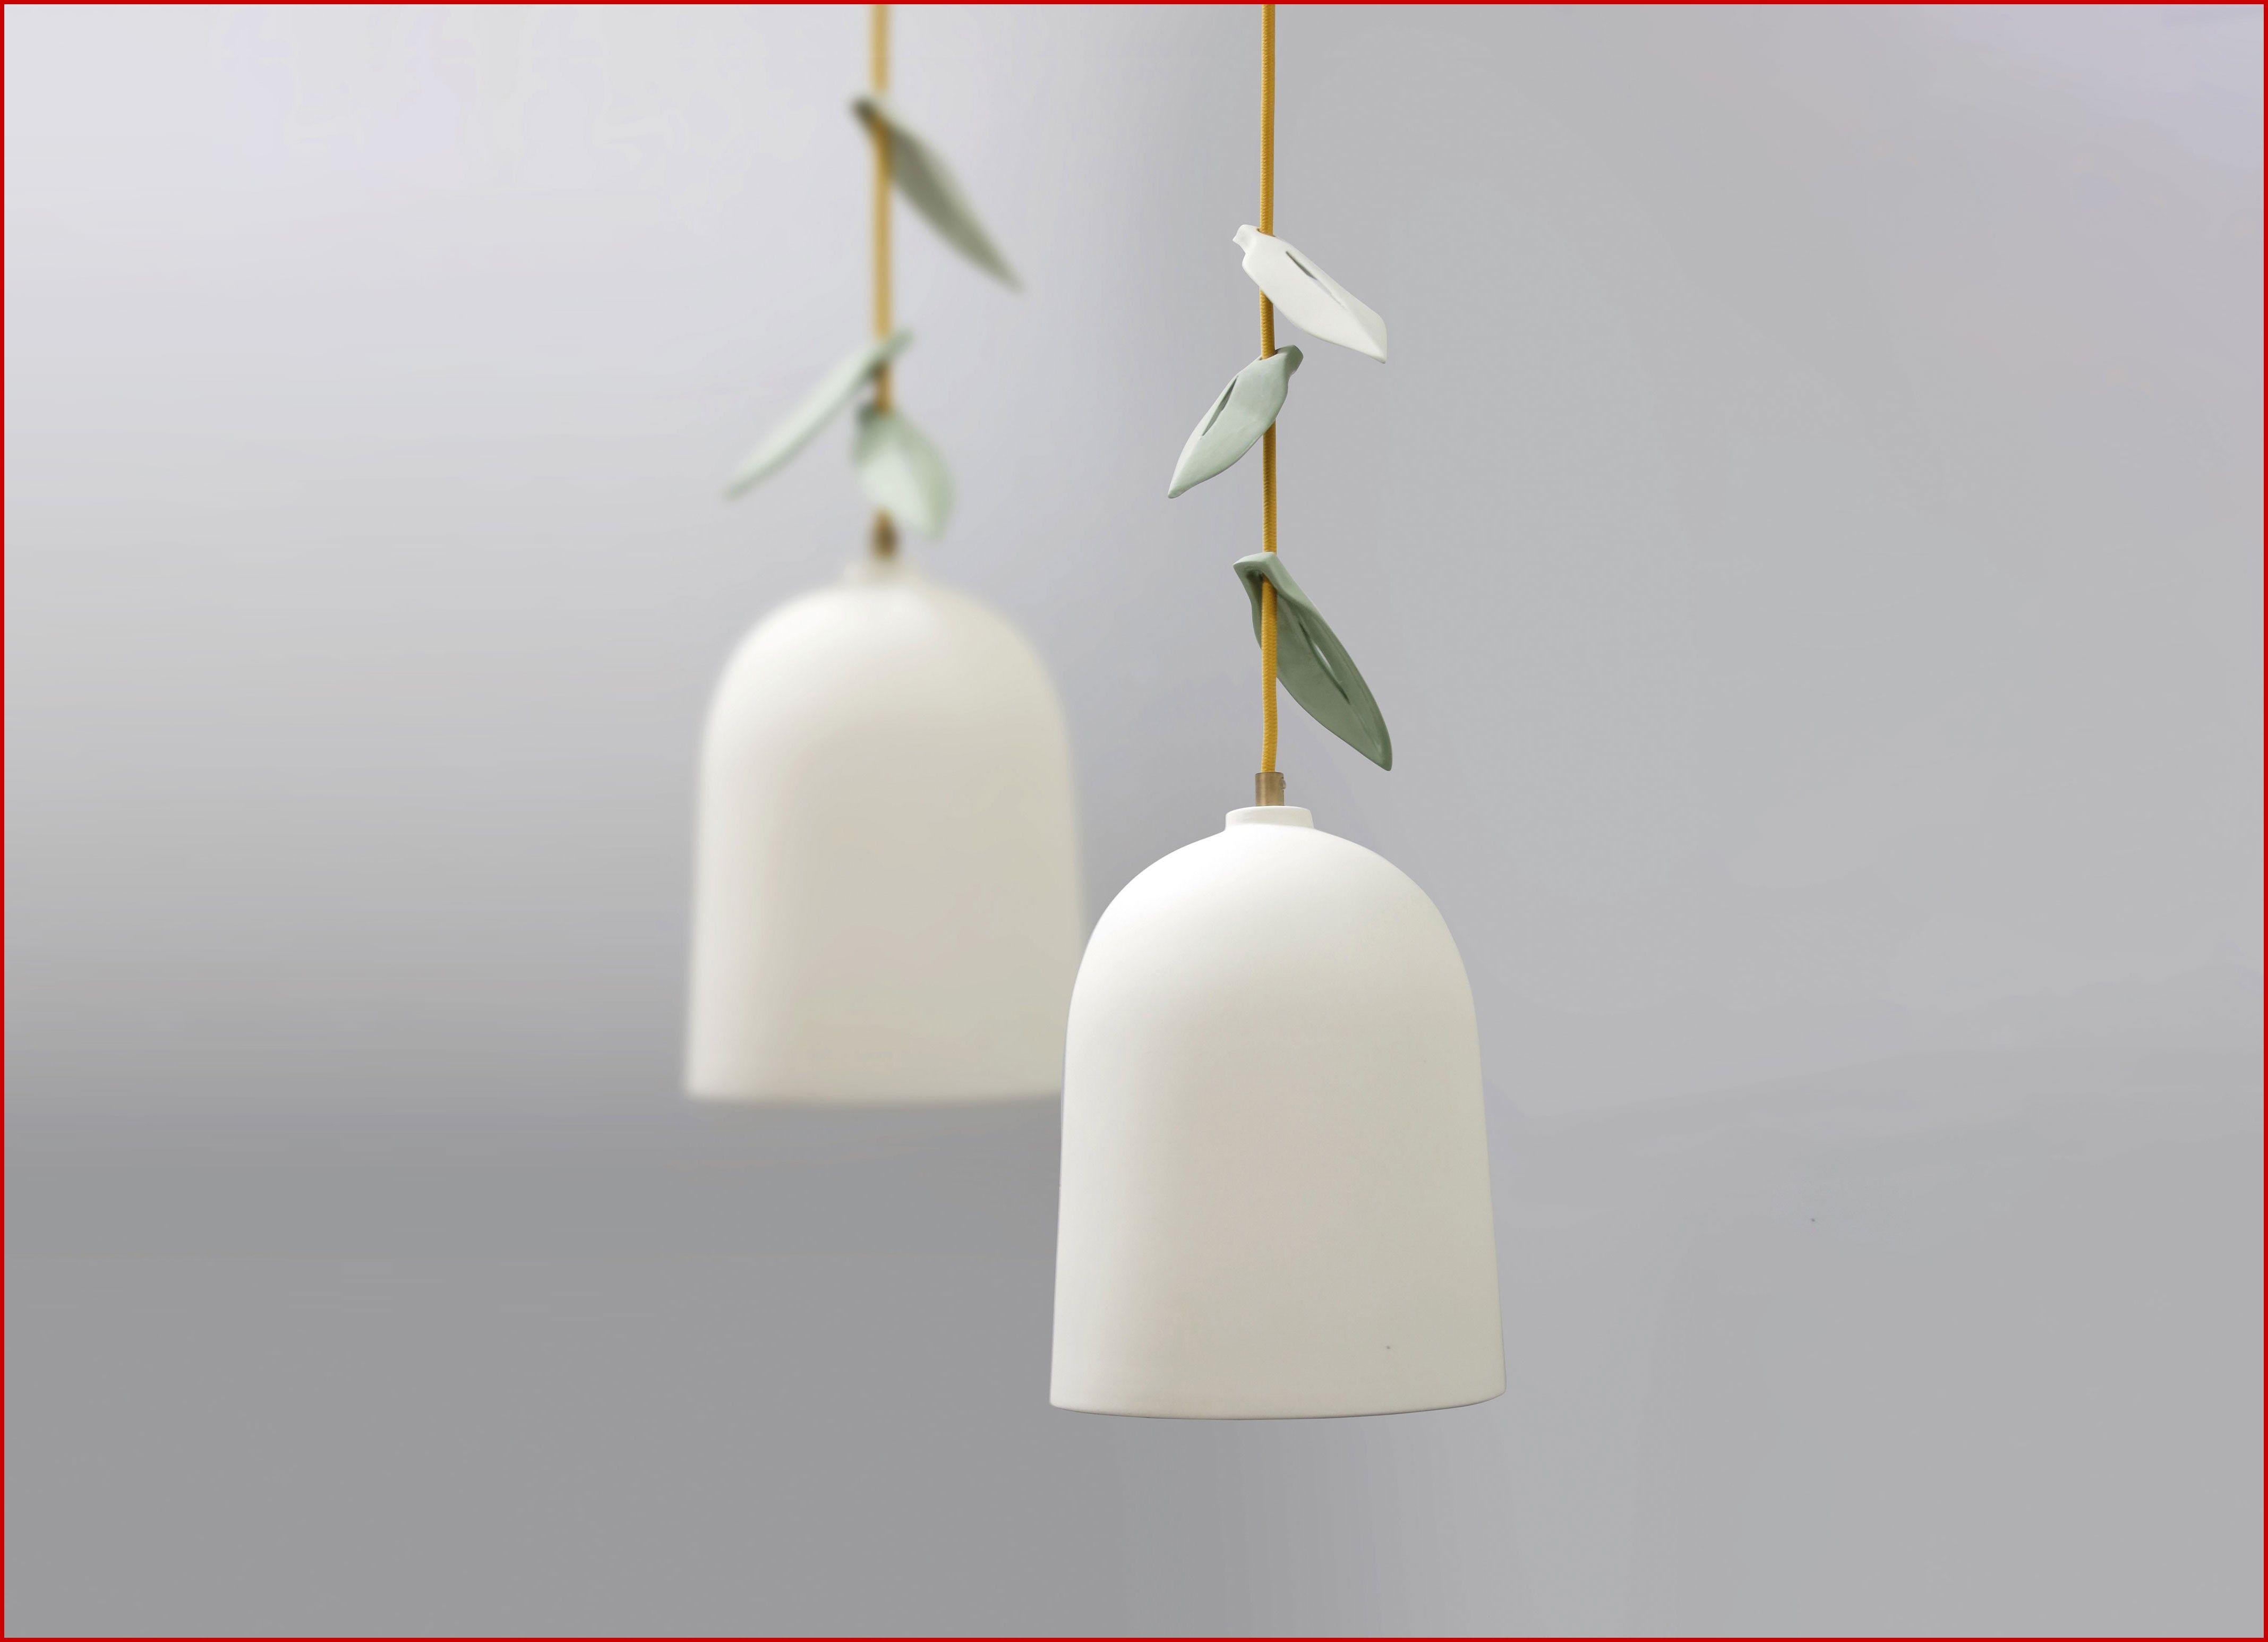 Kleine hanglamp keuken hanglamp slaapkamer design idee n